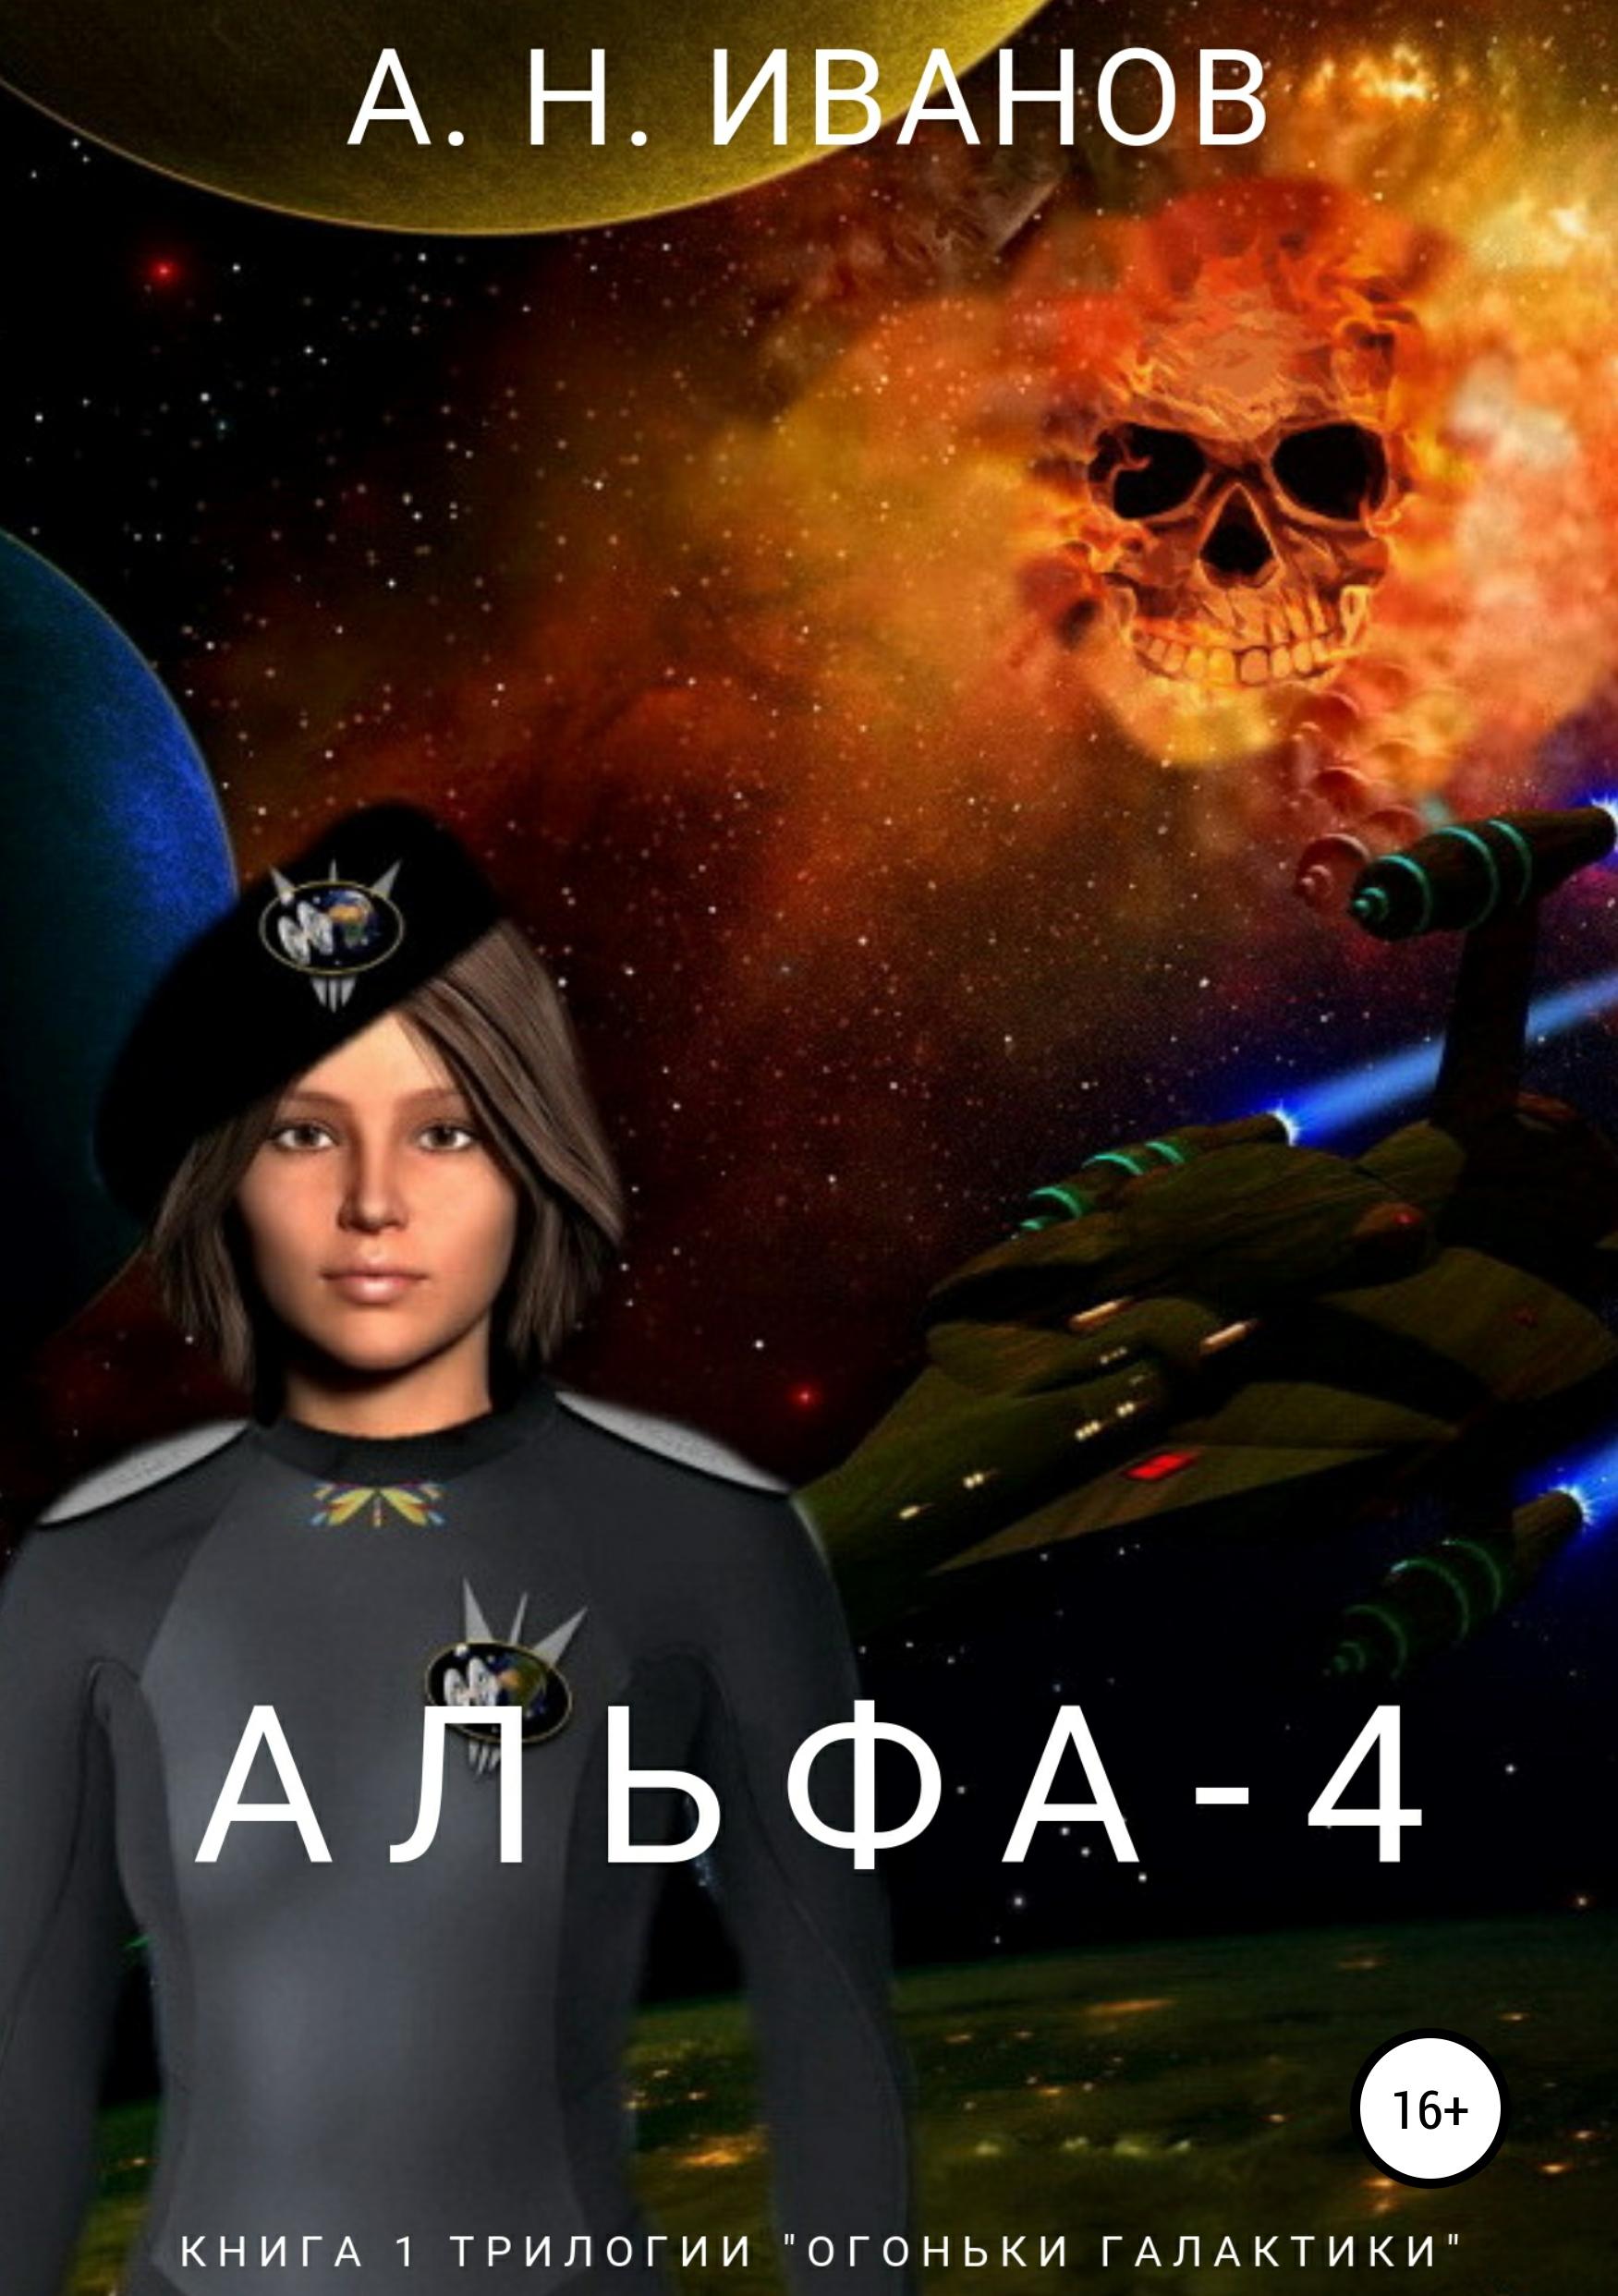 Альфа-4